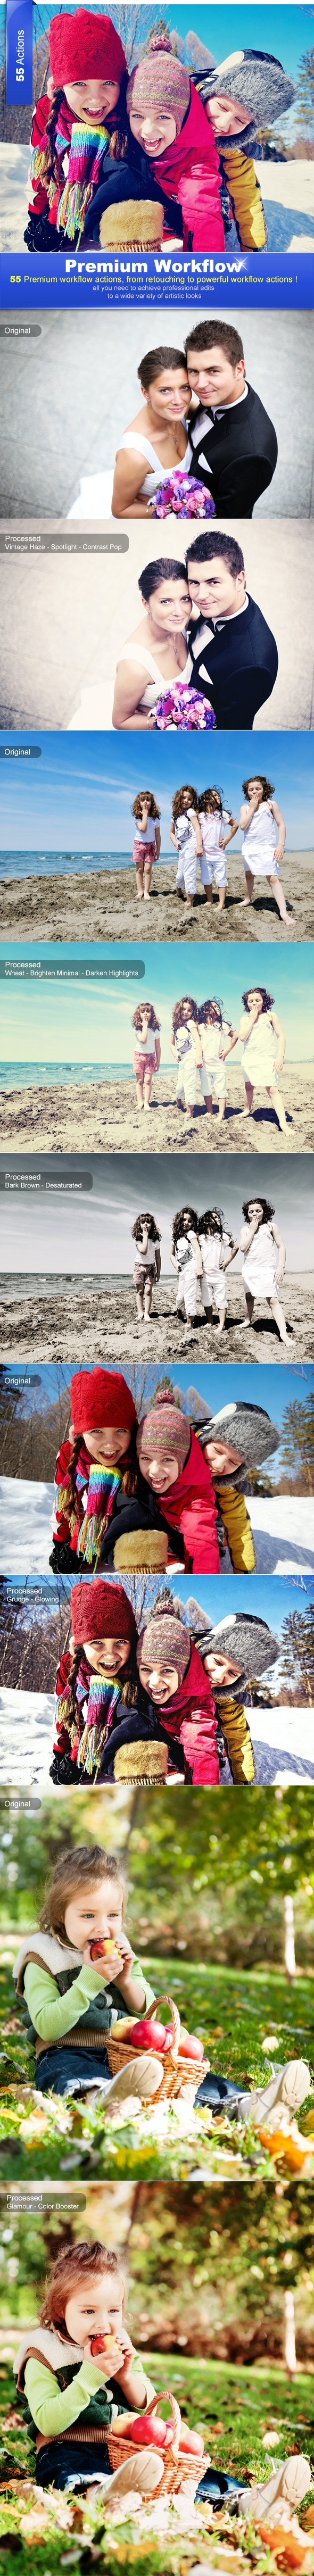 Premium Workflow Bundle - Actions Photoshop